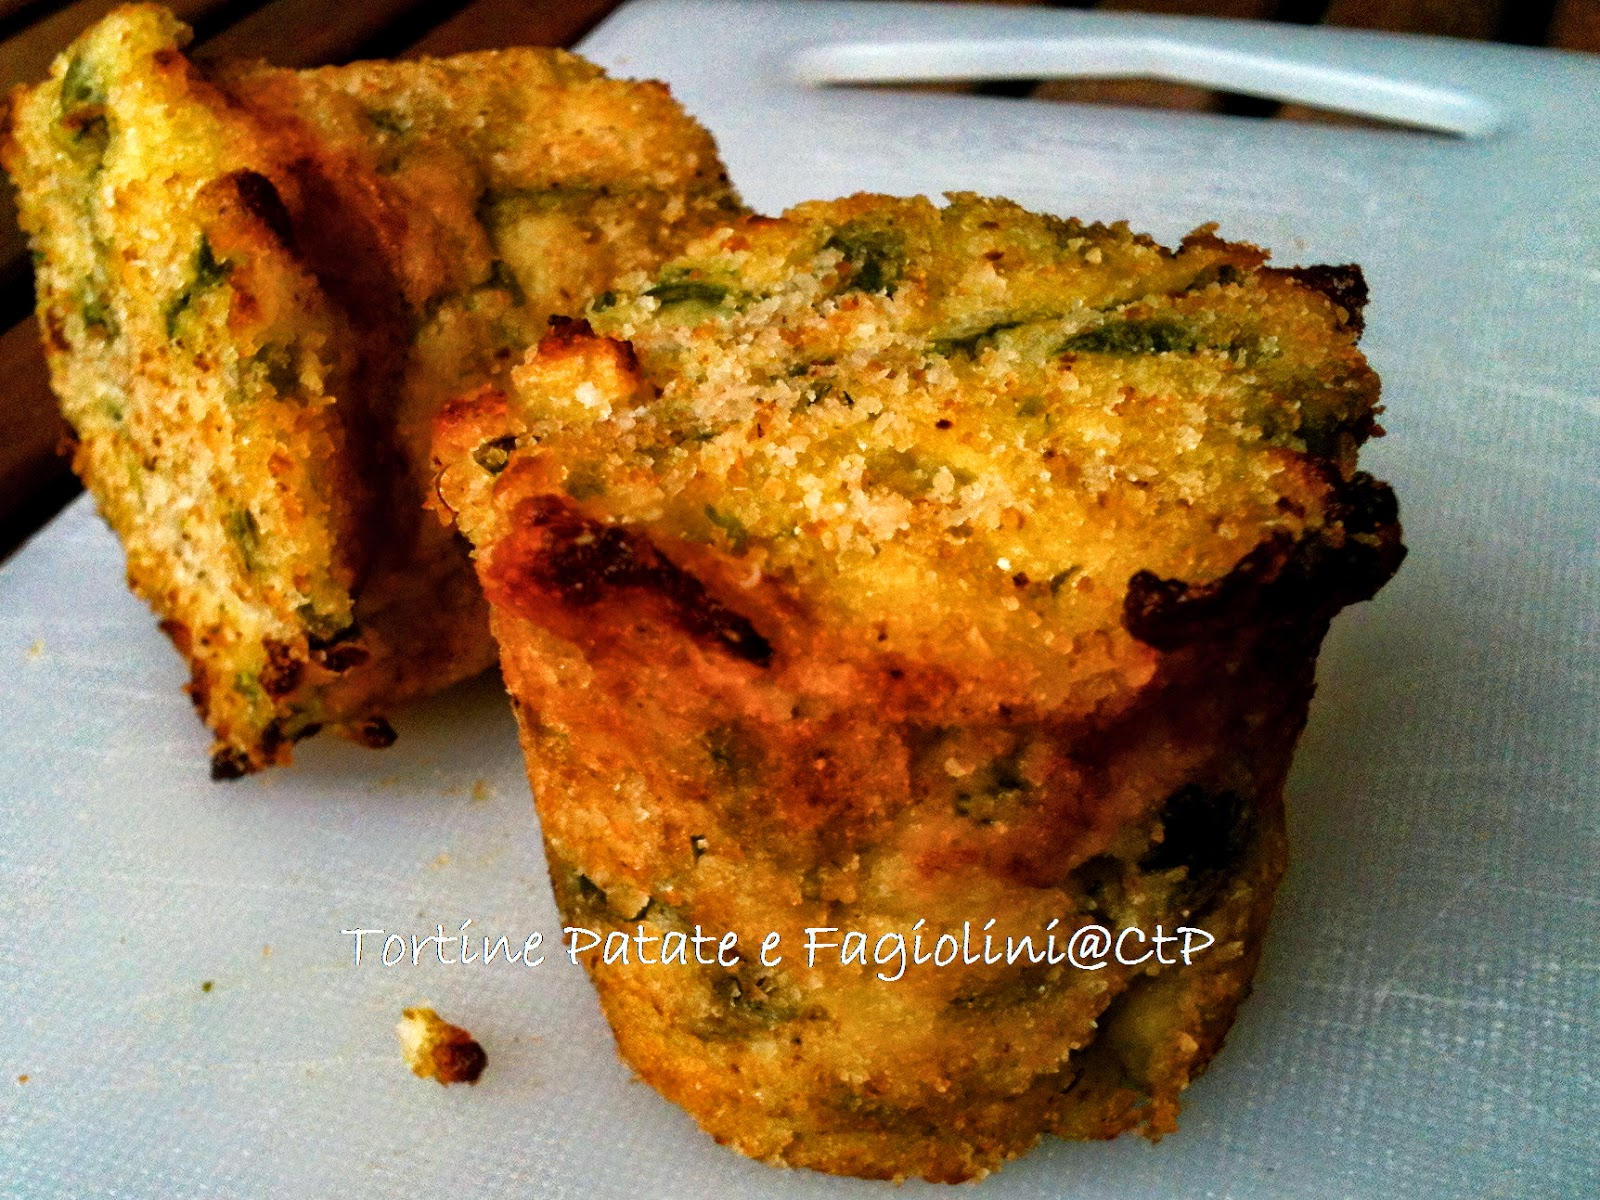 ricetta tortine e torta salata di origine ligure patate fagiolini menta e parmigiano